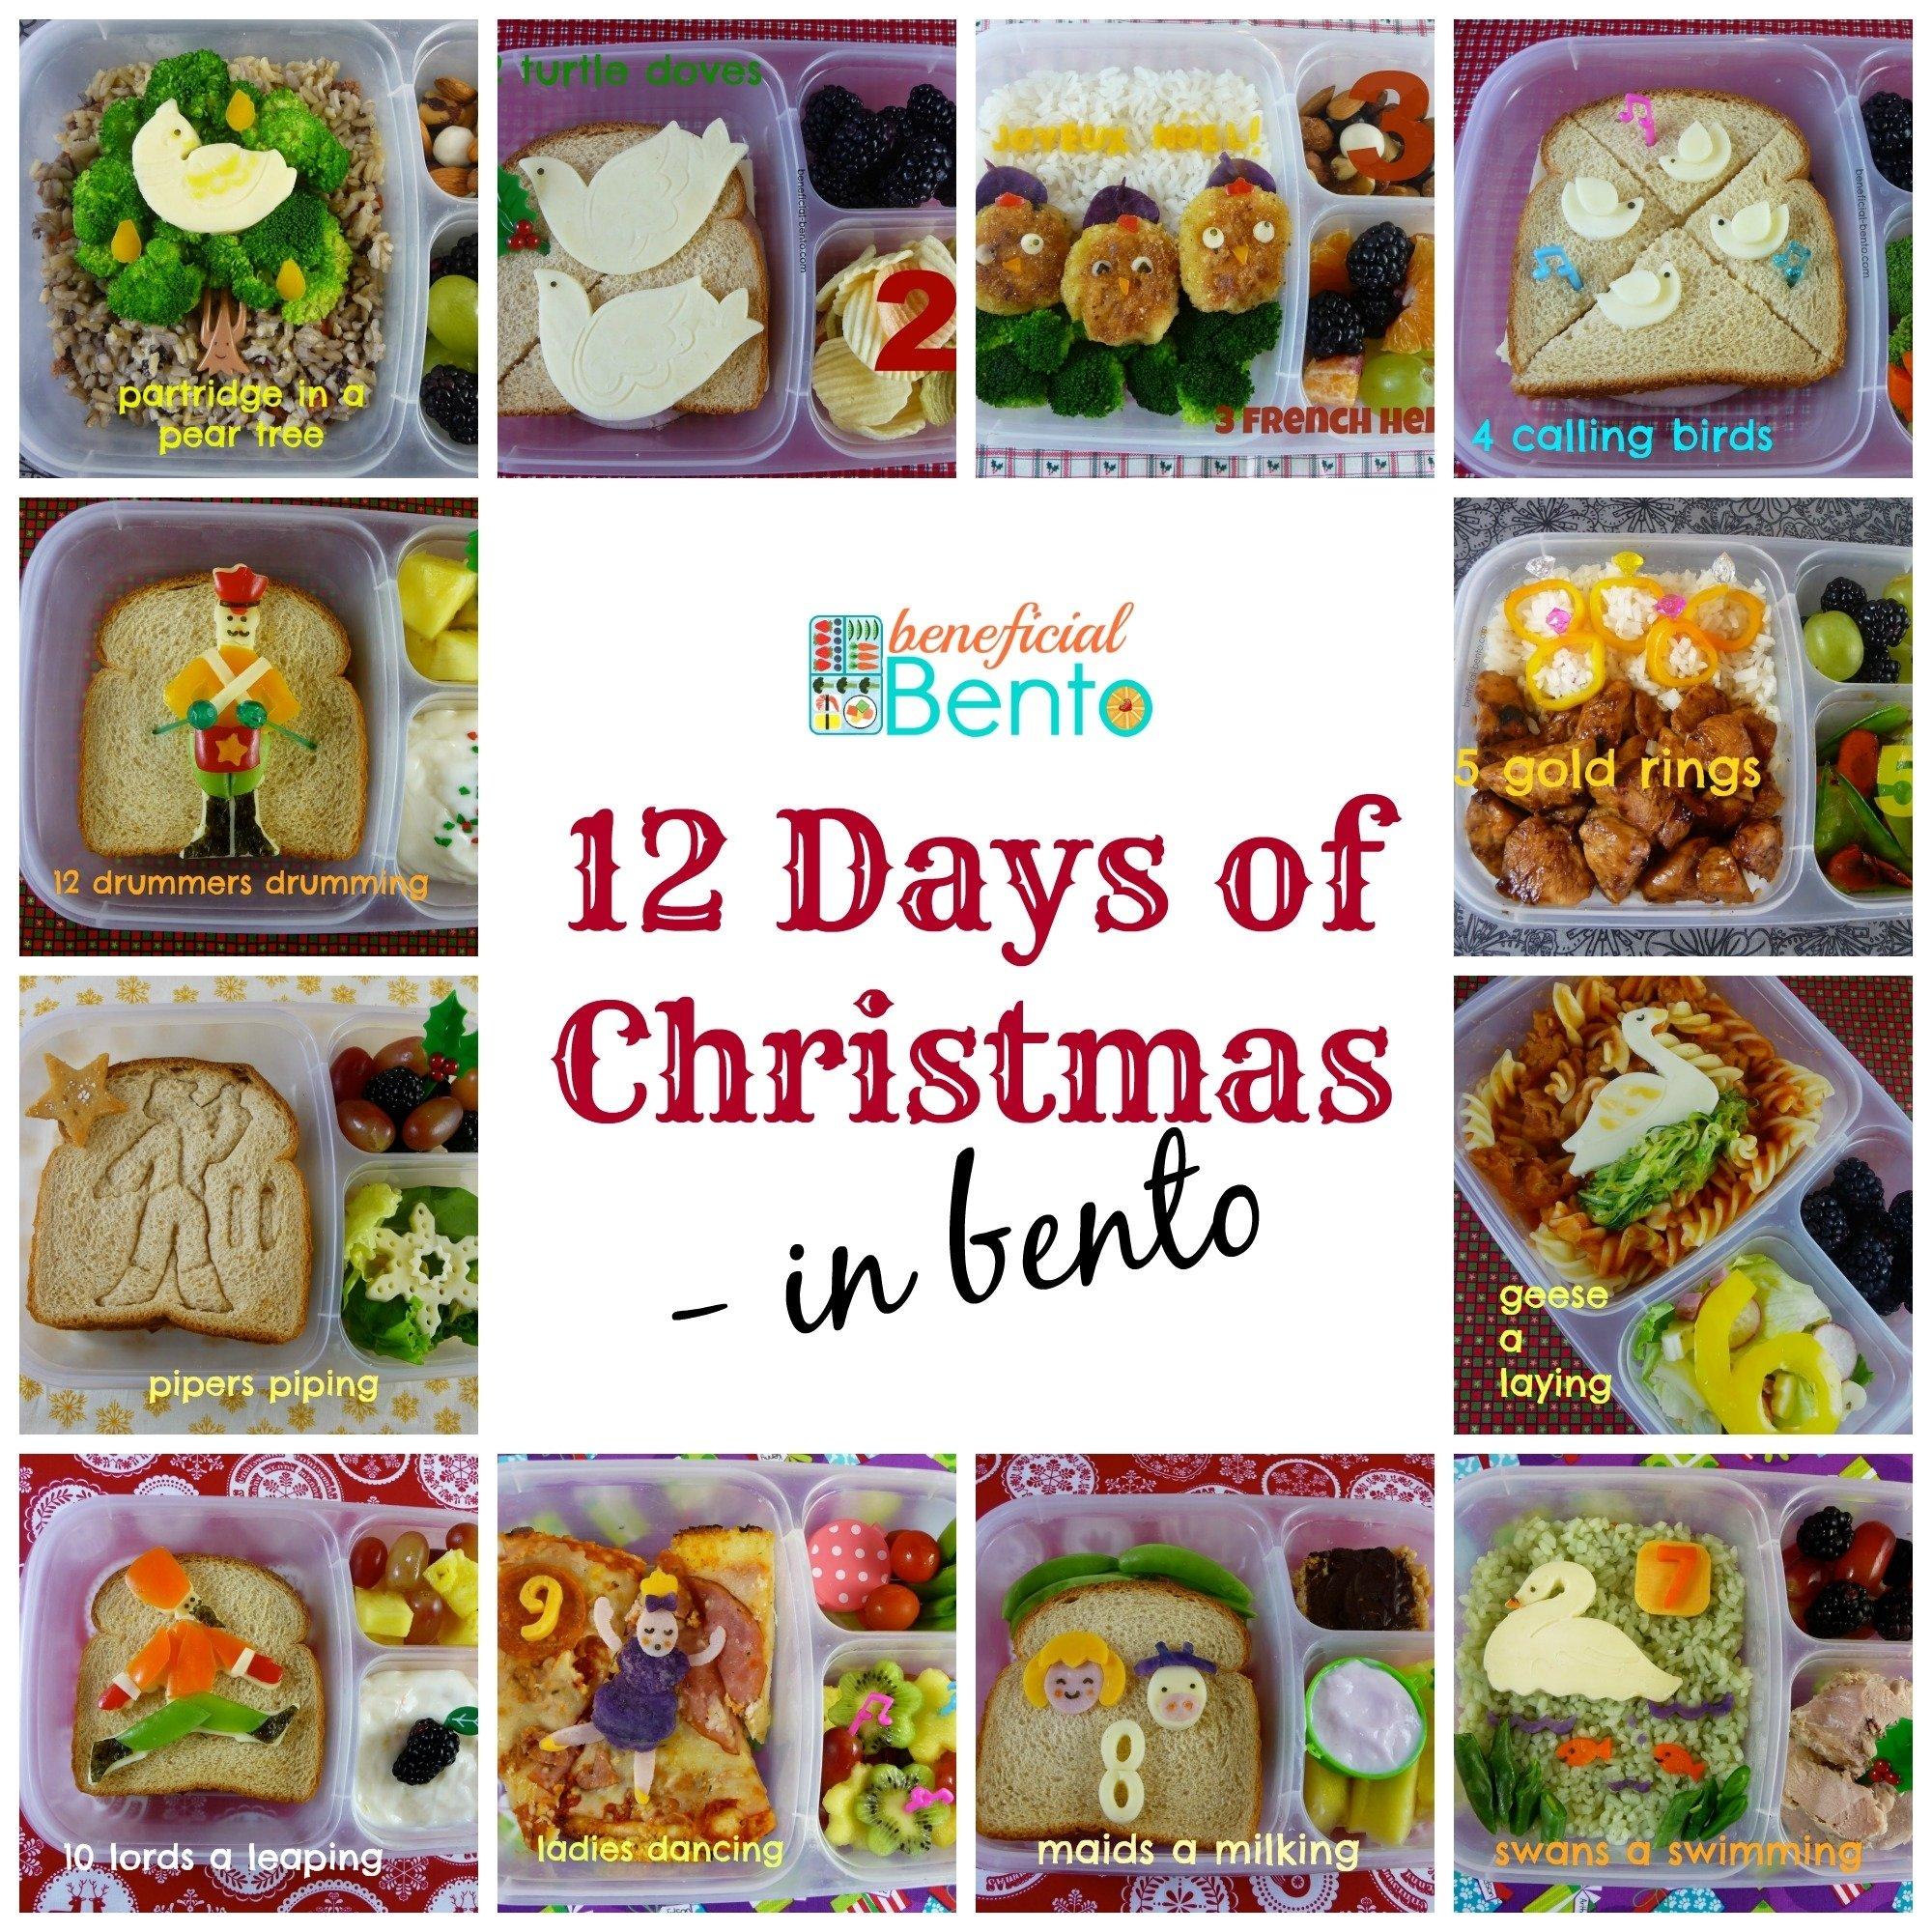 the 12 days of christmas in bento - beneficial bento